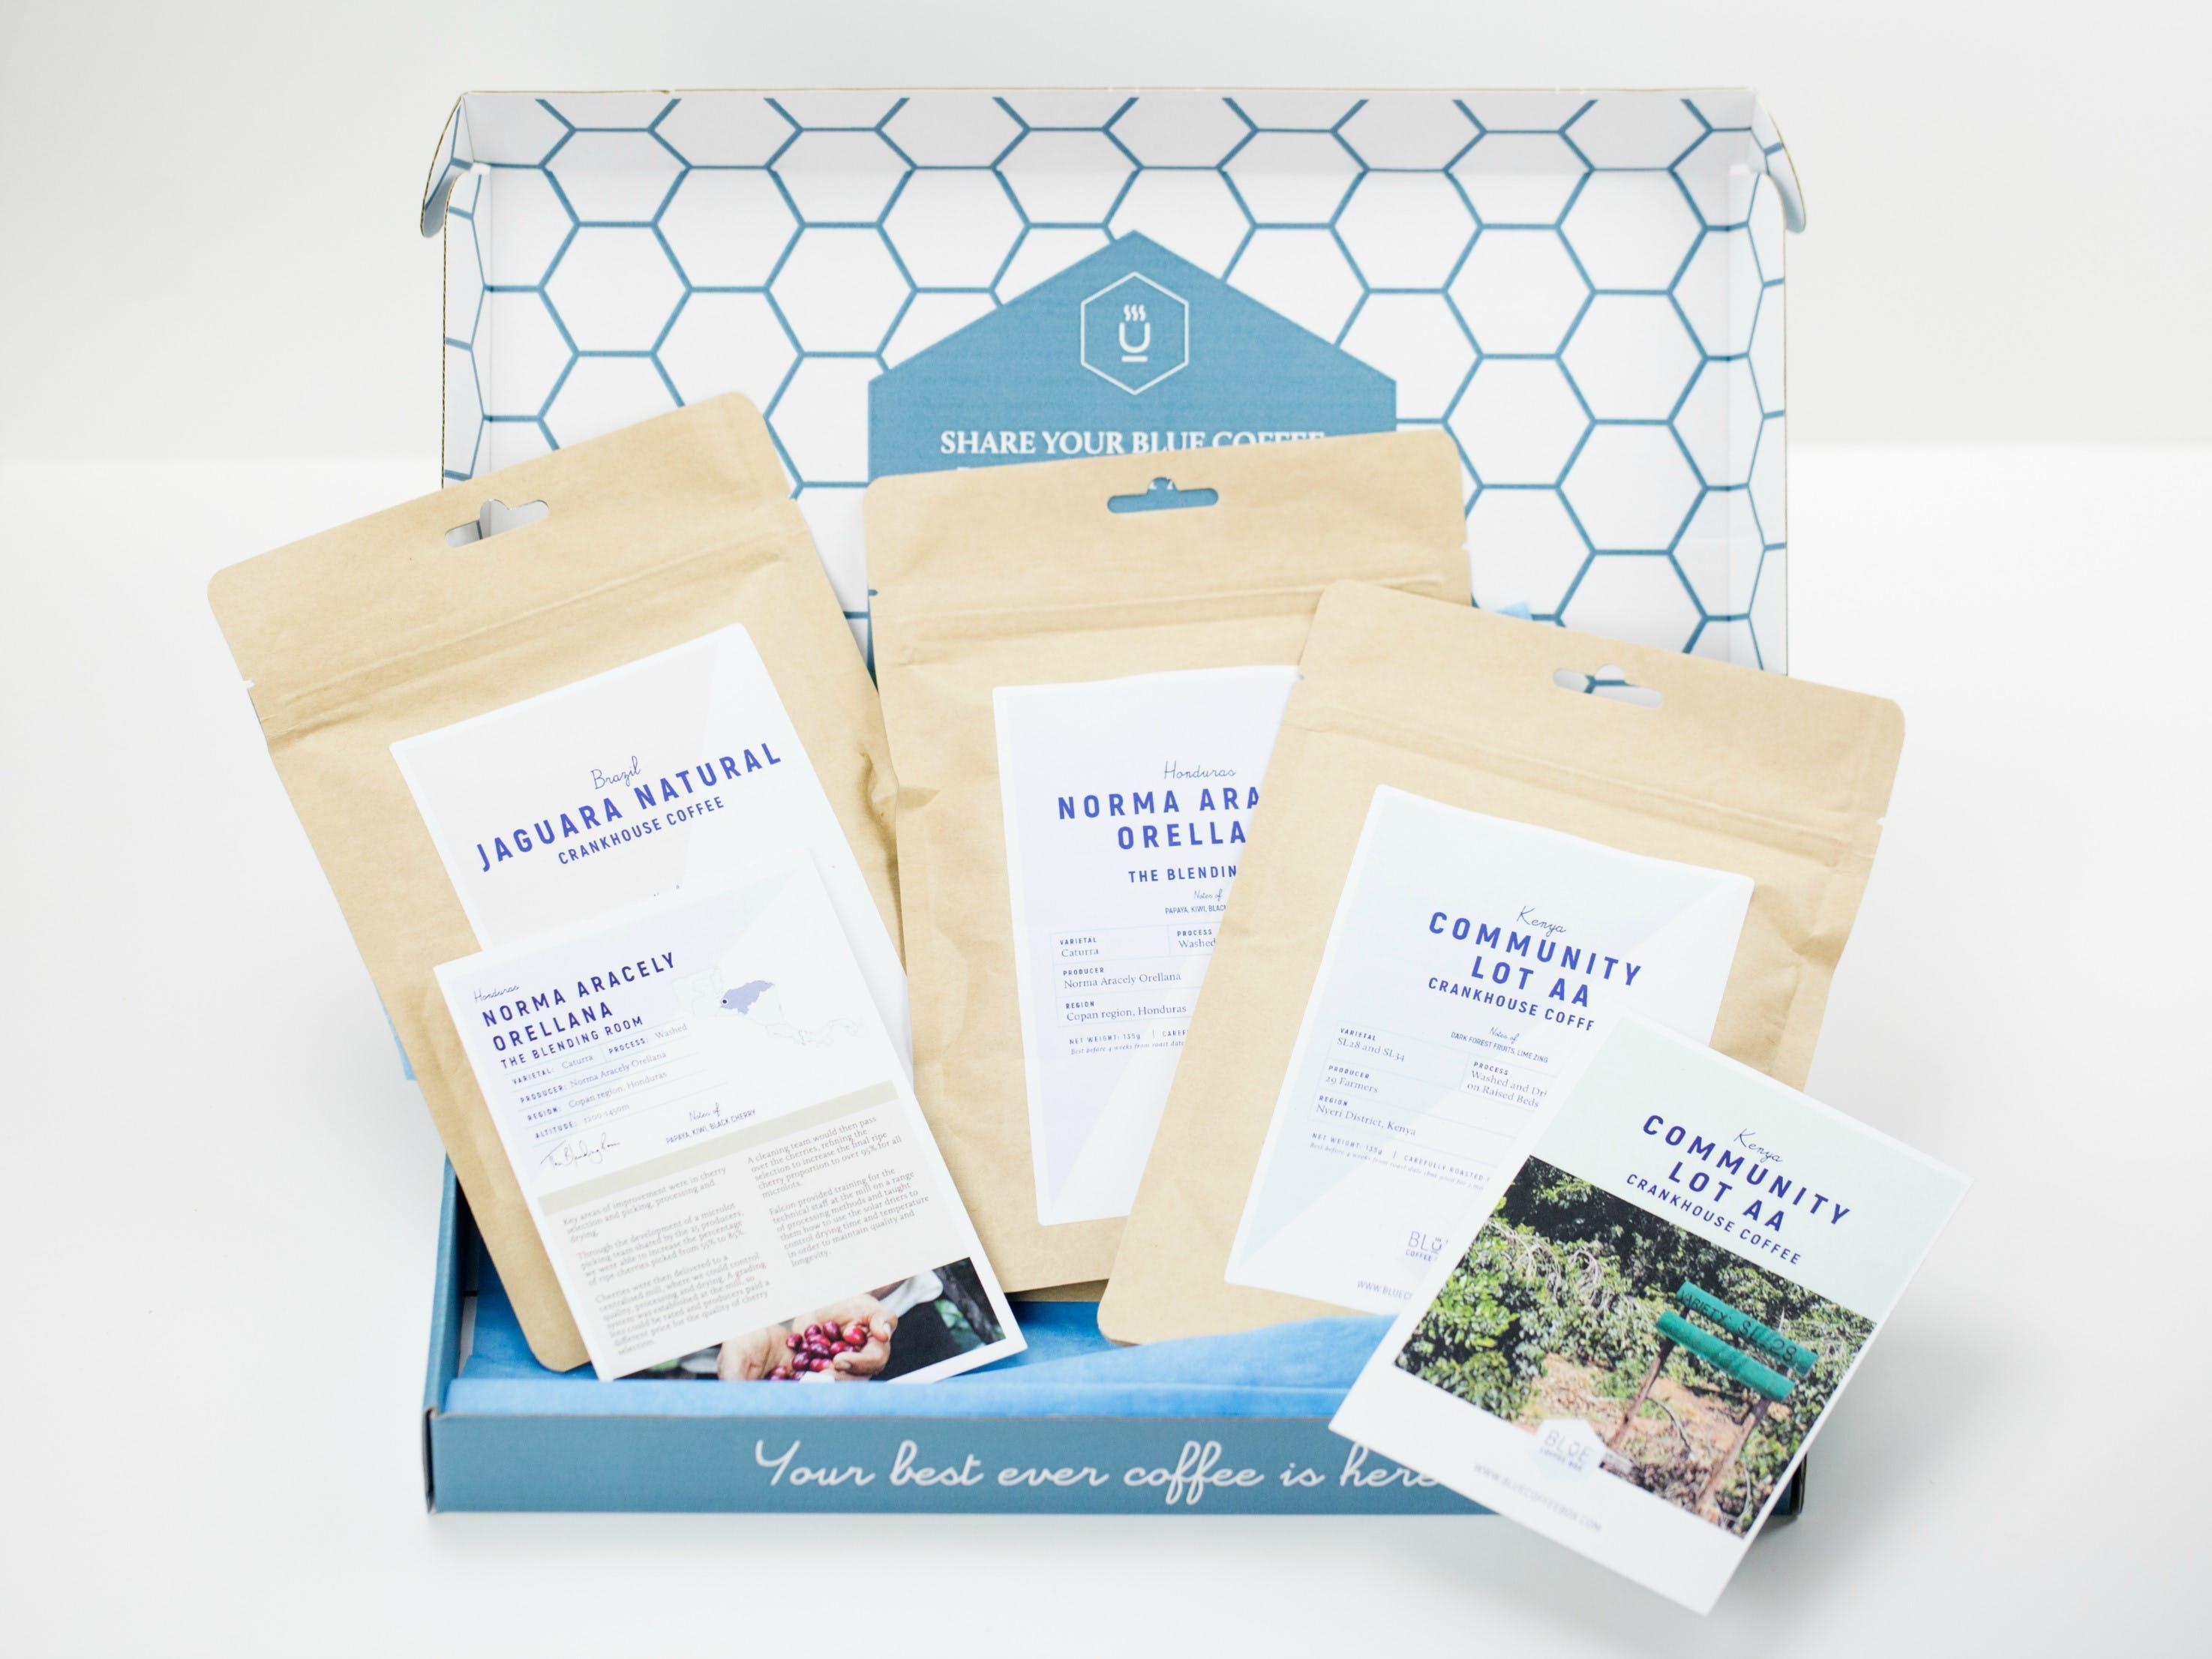 Blue Coffee Box Subscription Box